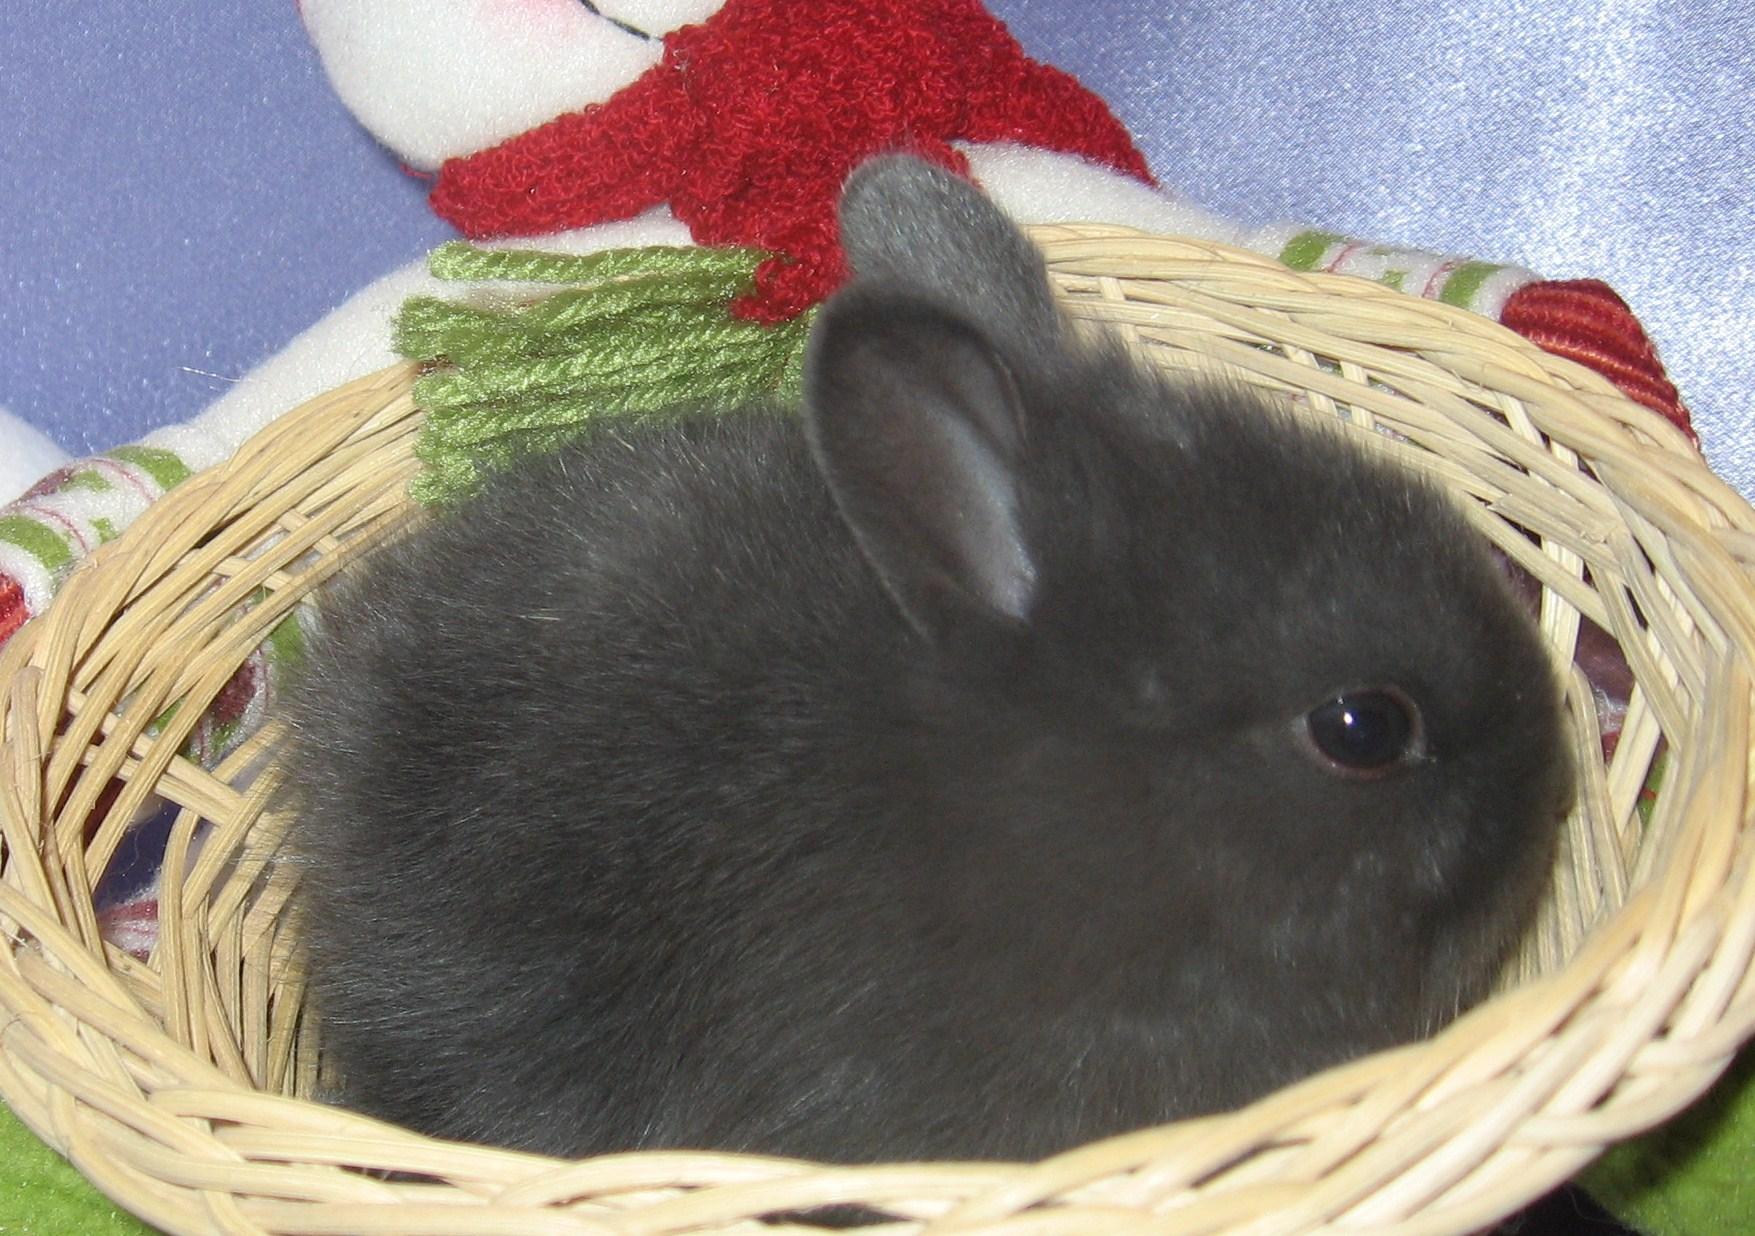 Как кормить декоративного кролика в домашних условиях 253